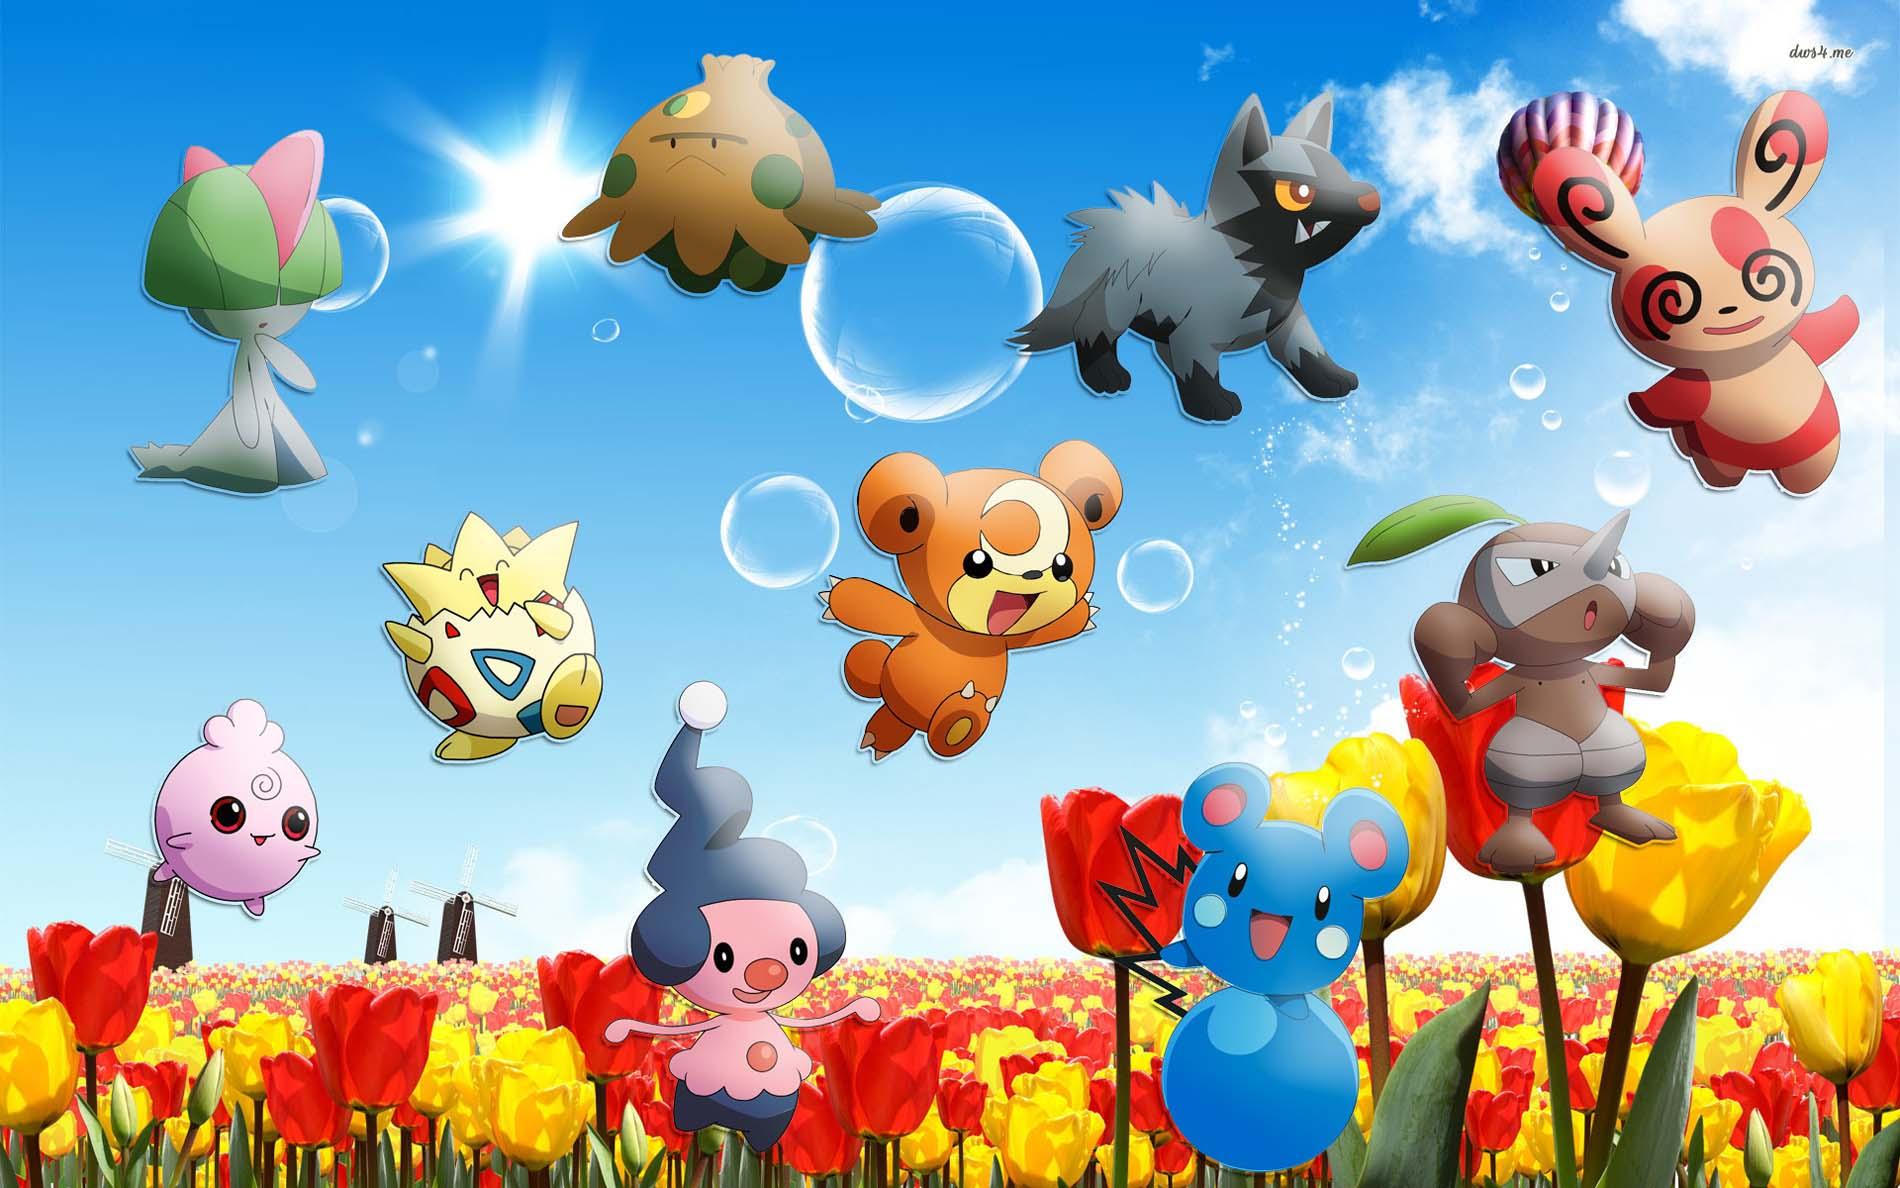 Cute Pokemon Wallpaper Res 1900x1188PX Cutest